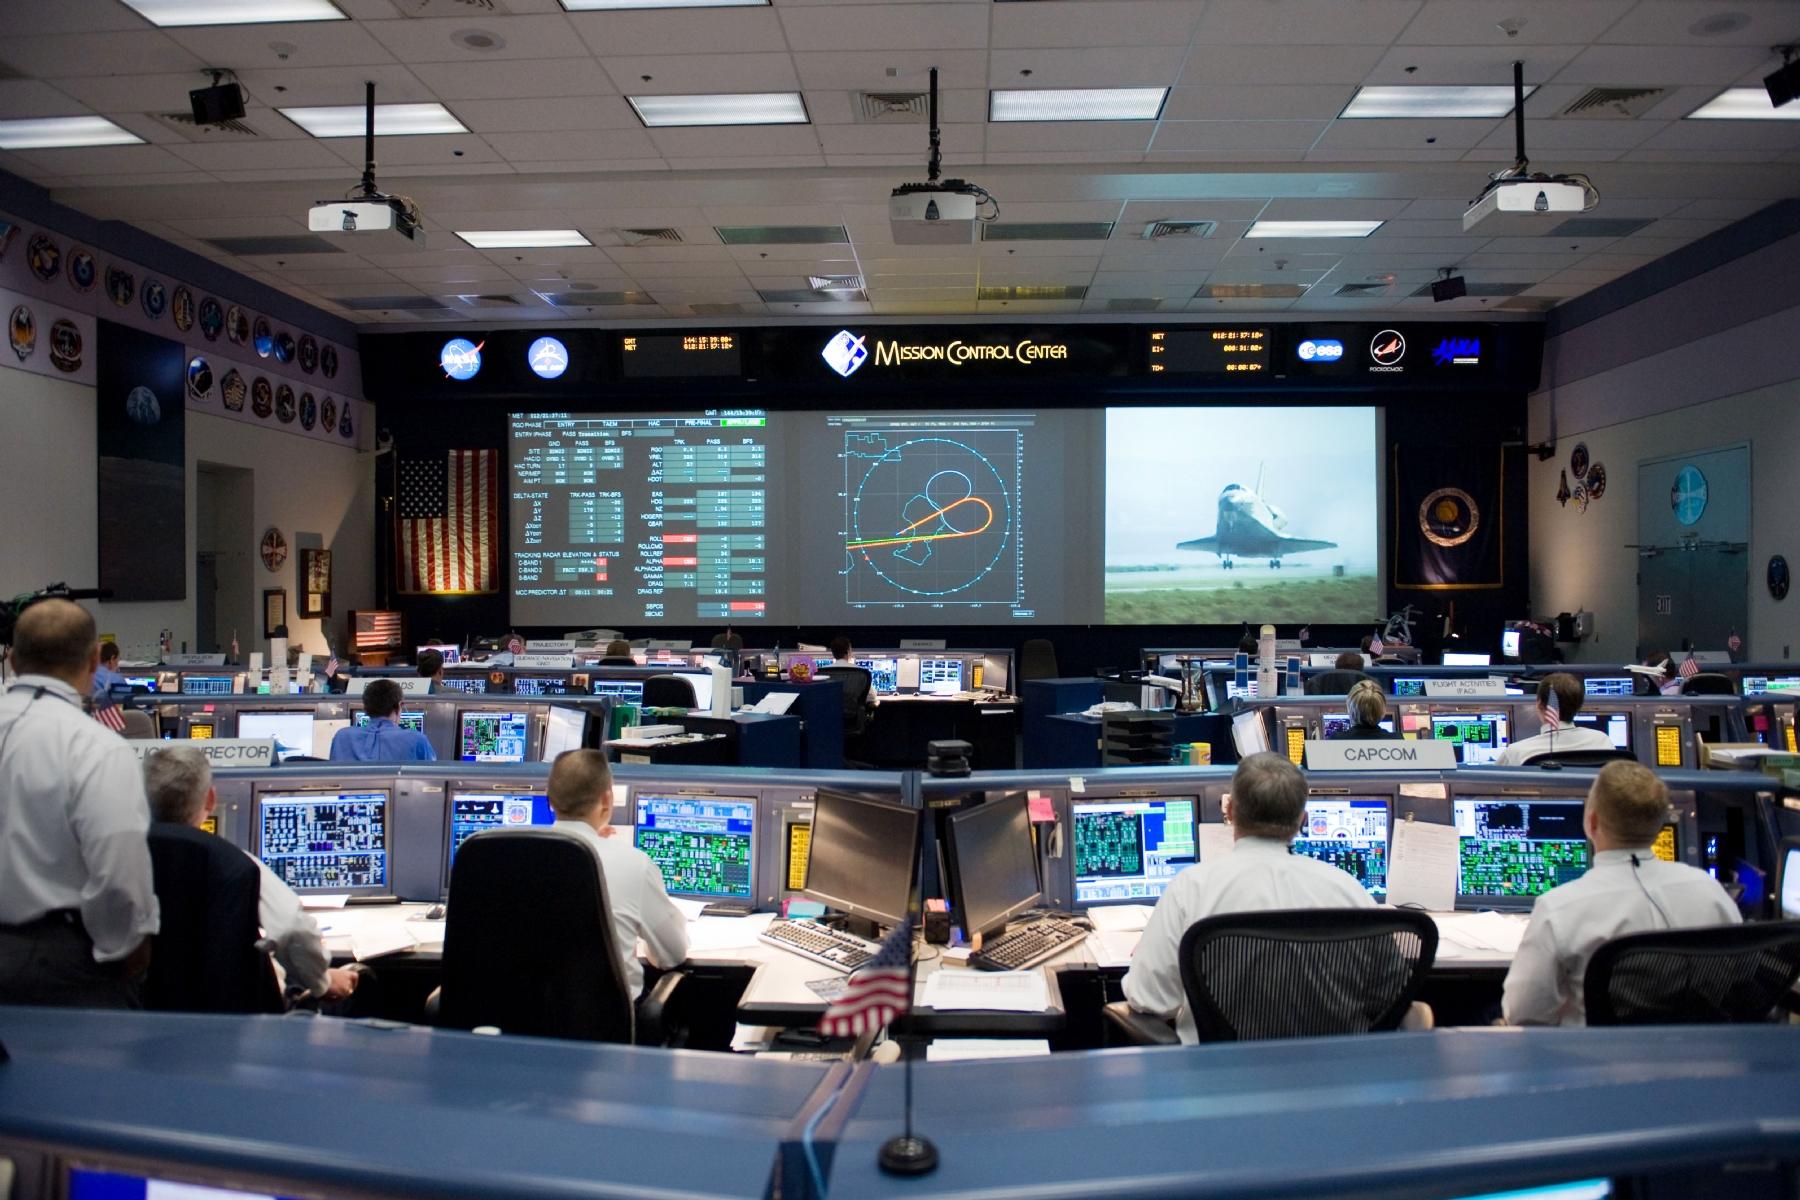 NASA offers dream job for aspiring astronauts; accepting applications for future explorers